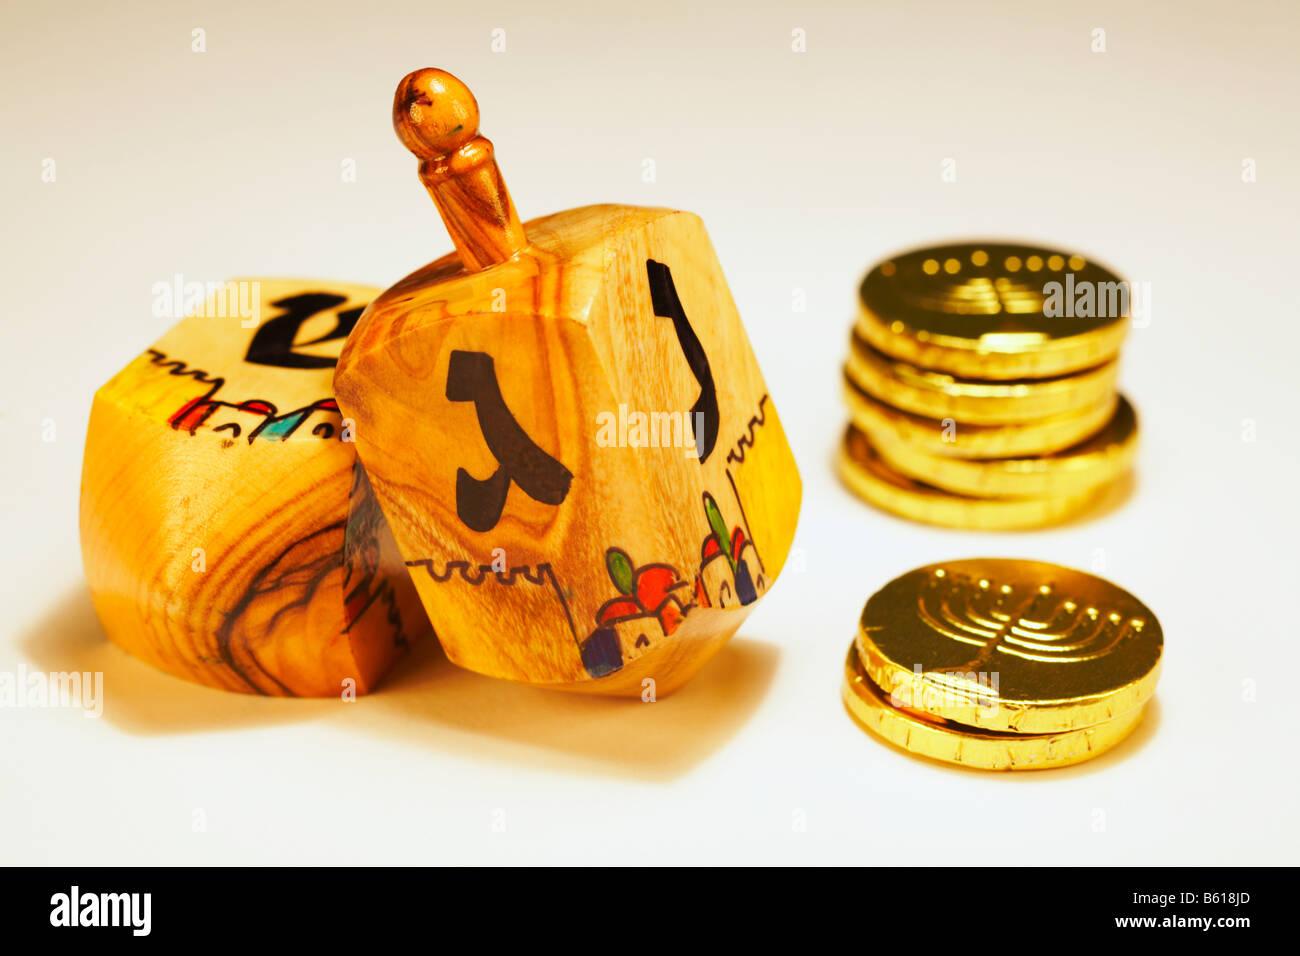 Jewish Dreidels Dreydles with Hanukkah Chanukah chocolate gold ...